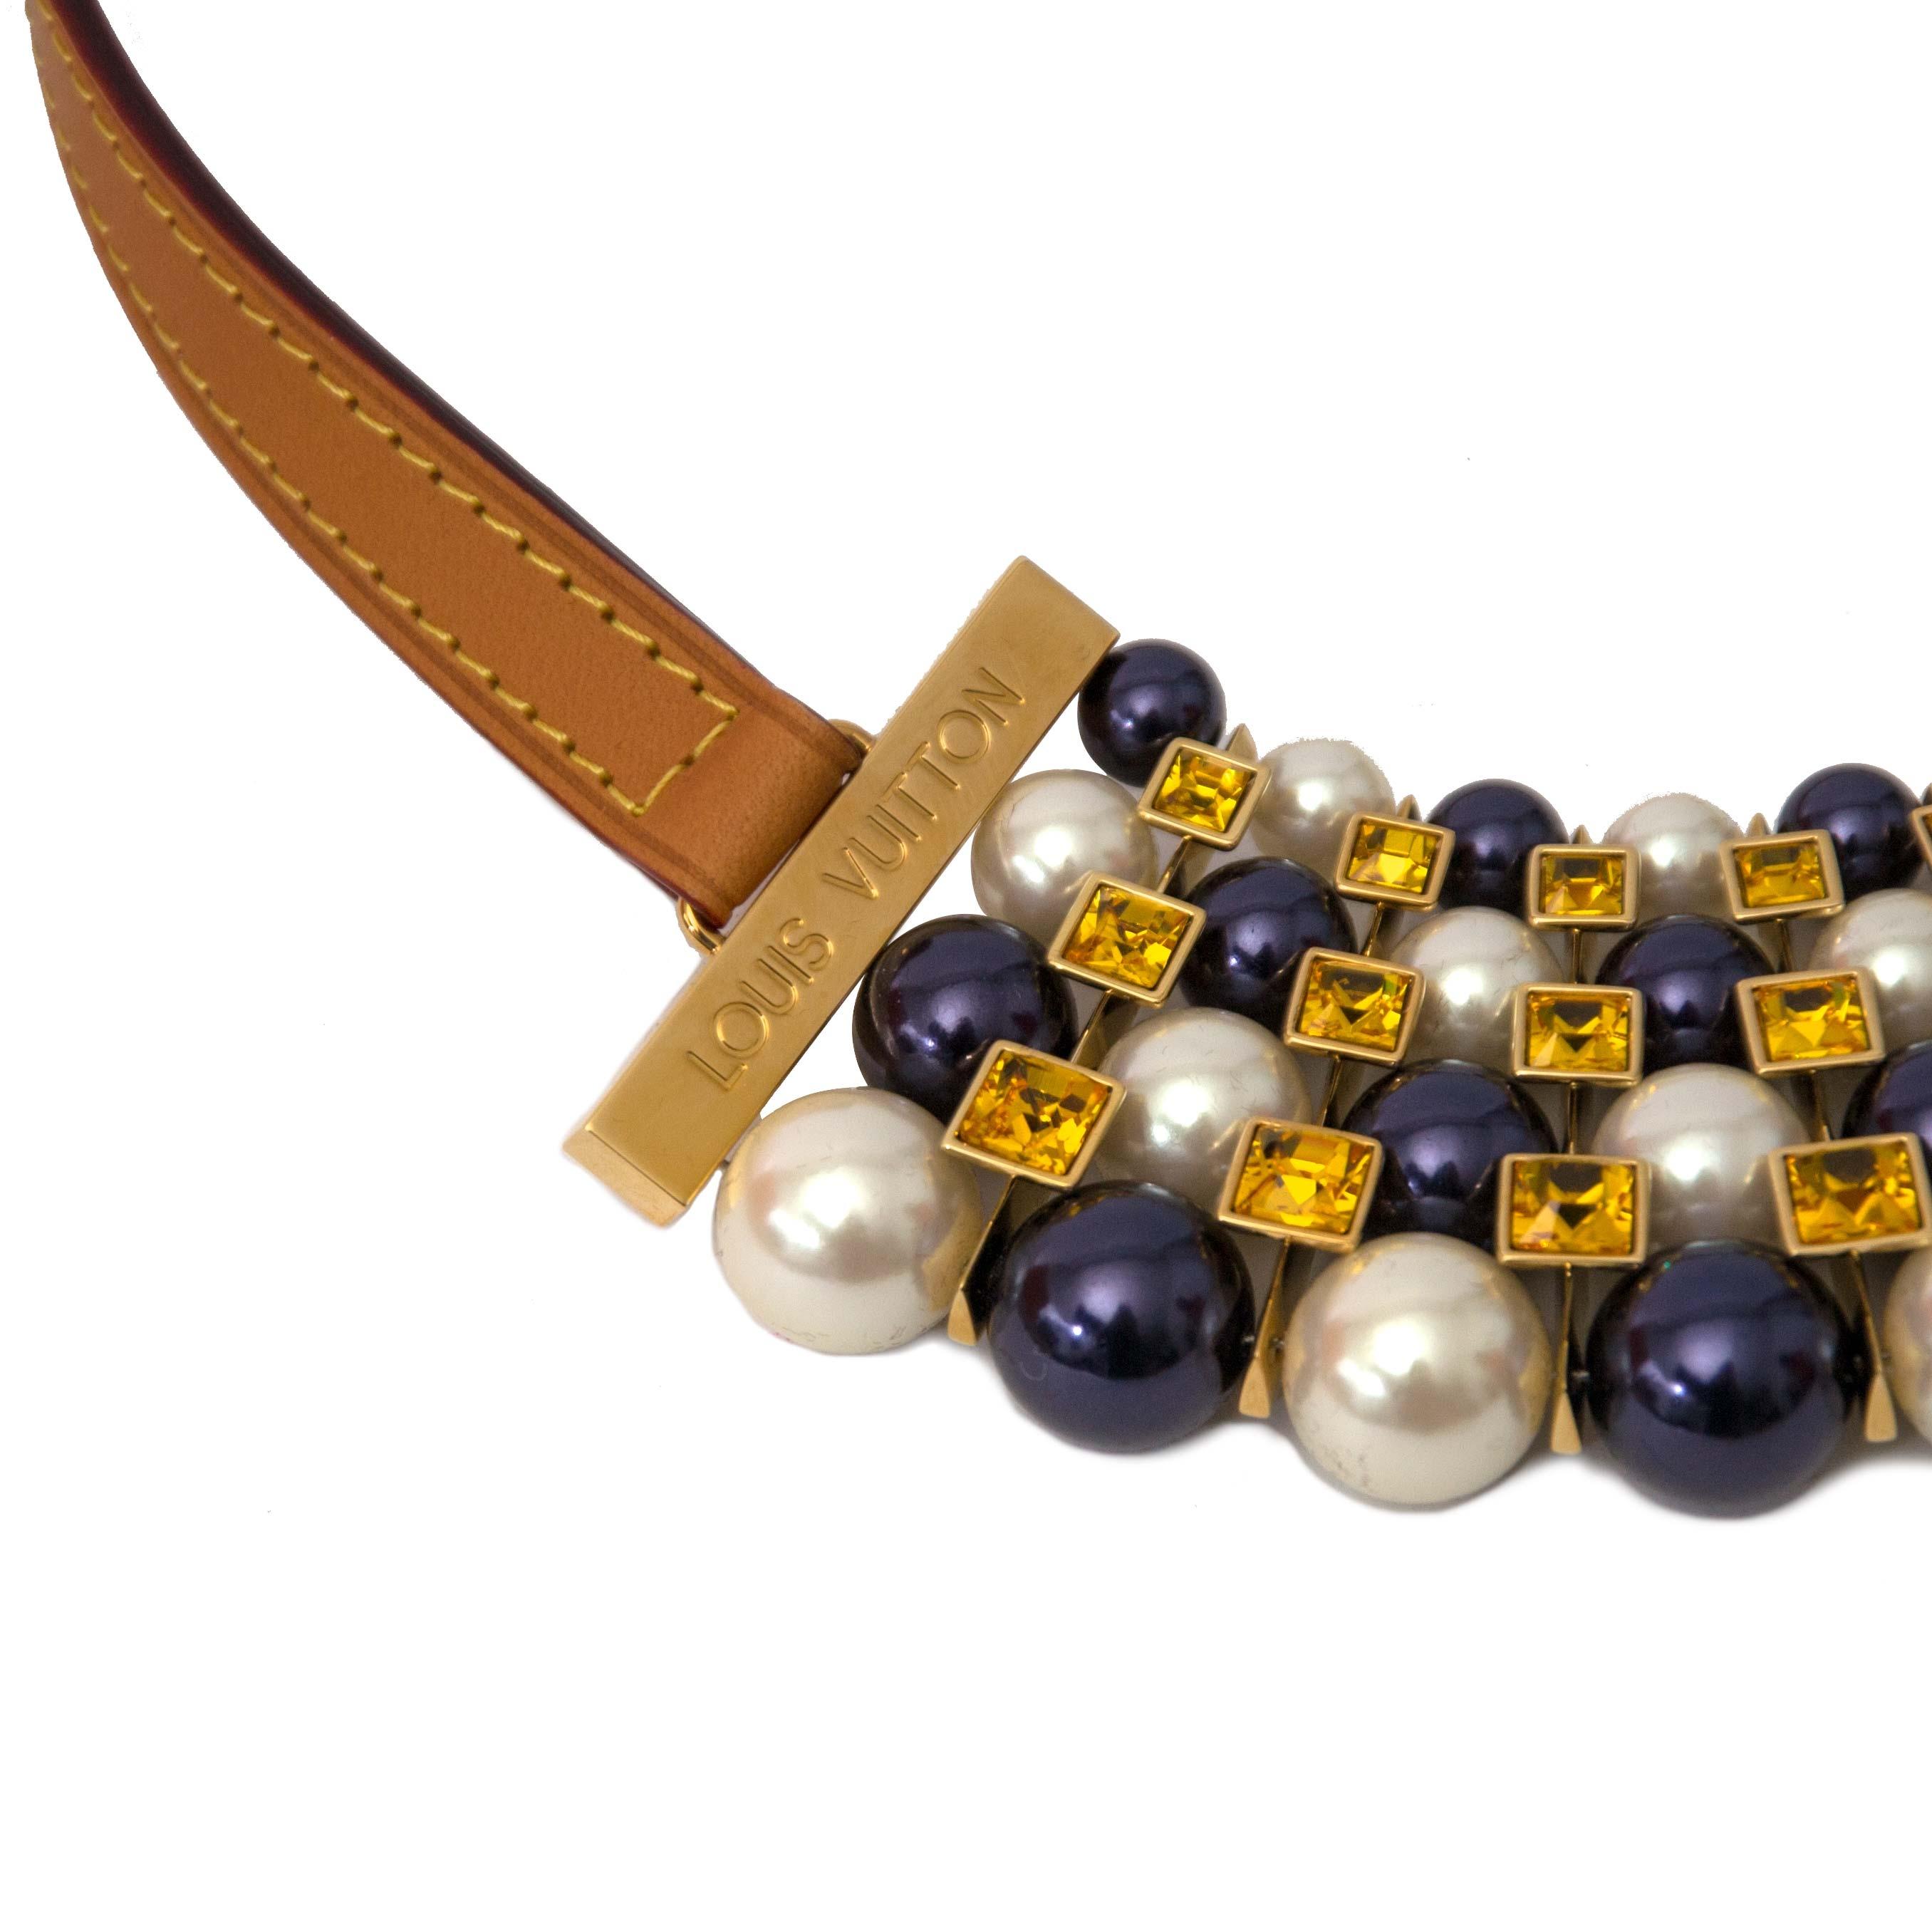 Louis Vuitton Collier Pearls and Crystals collier for the best price available online at Labellov. Koop en verkoop uw authentieke designer handtas aan de beste prijs bij Labellov. Koop en verkoop.